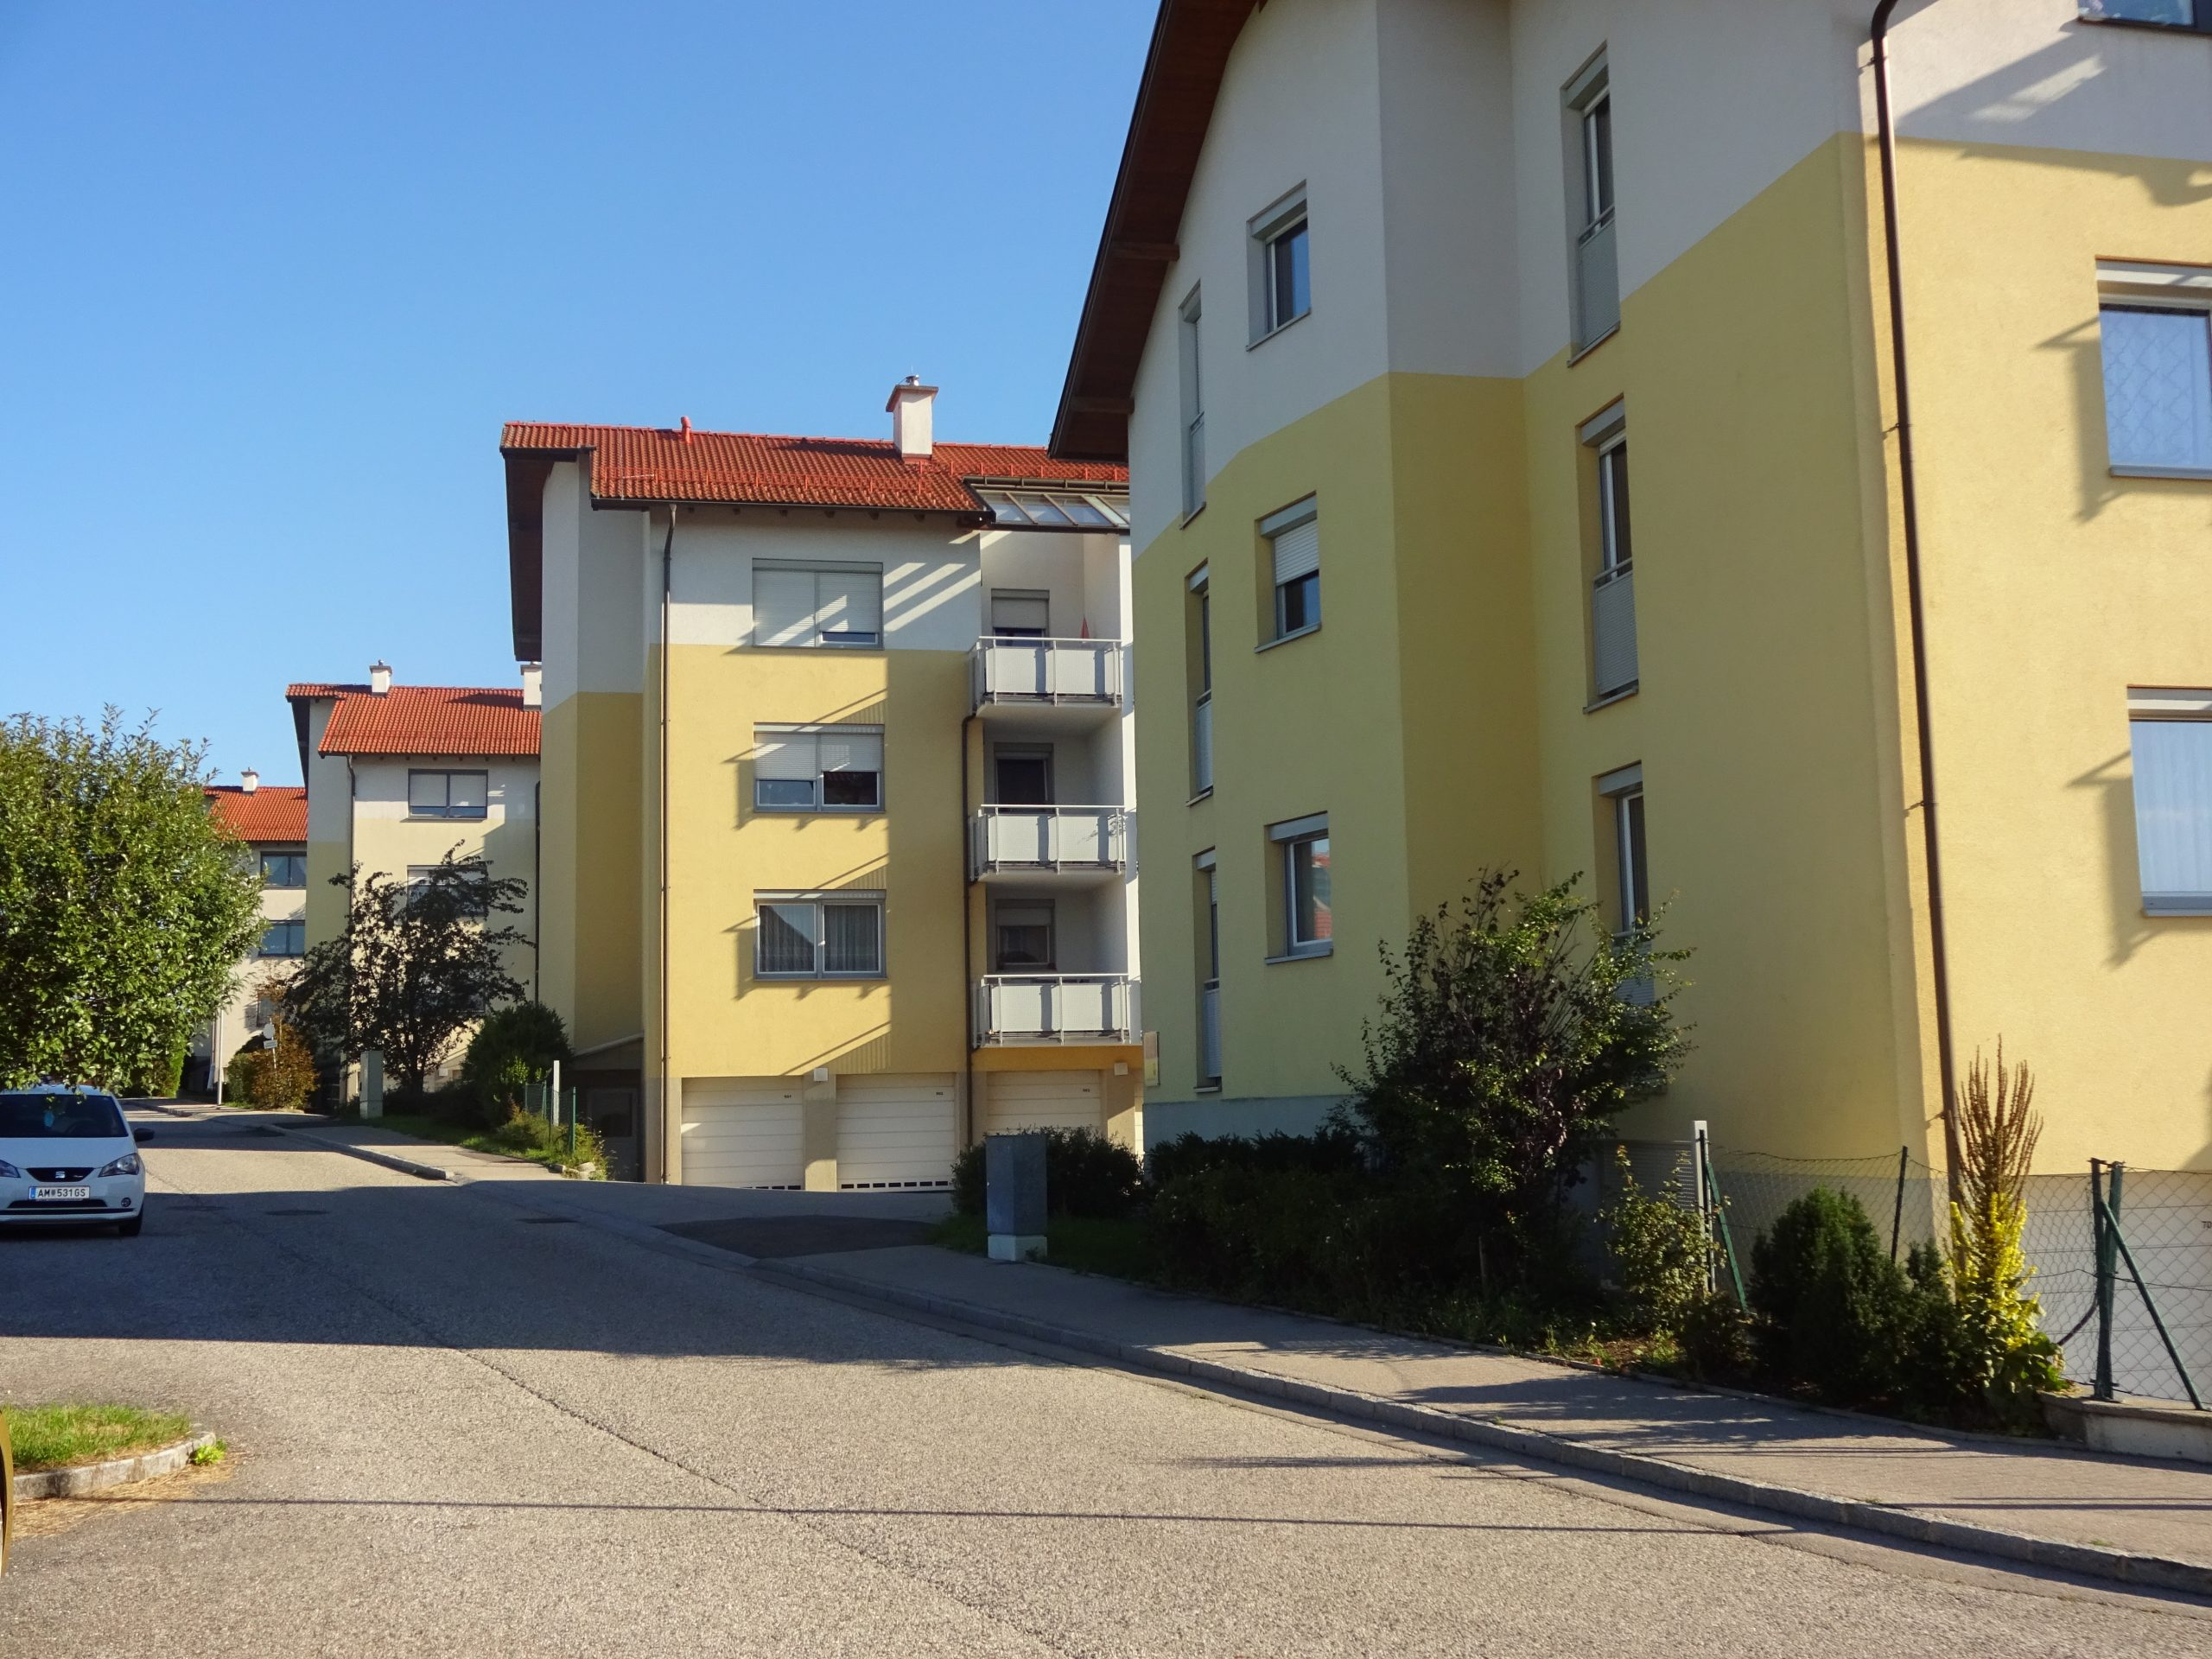 Immobilie von Kamptal in 3542 Gföhl, Krems(Land), Gföhl IV/3 - Top 704 #2